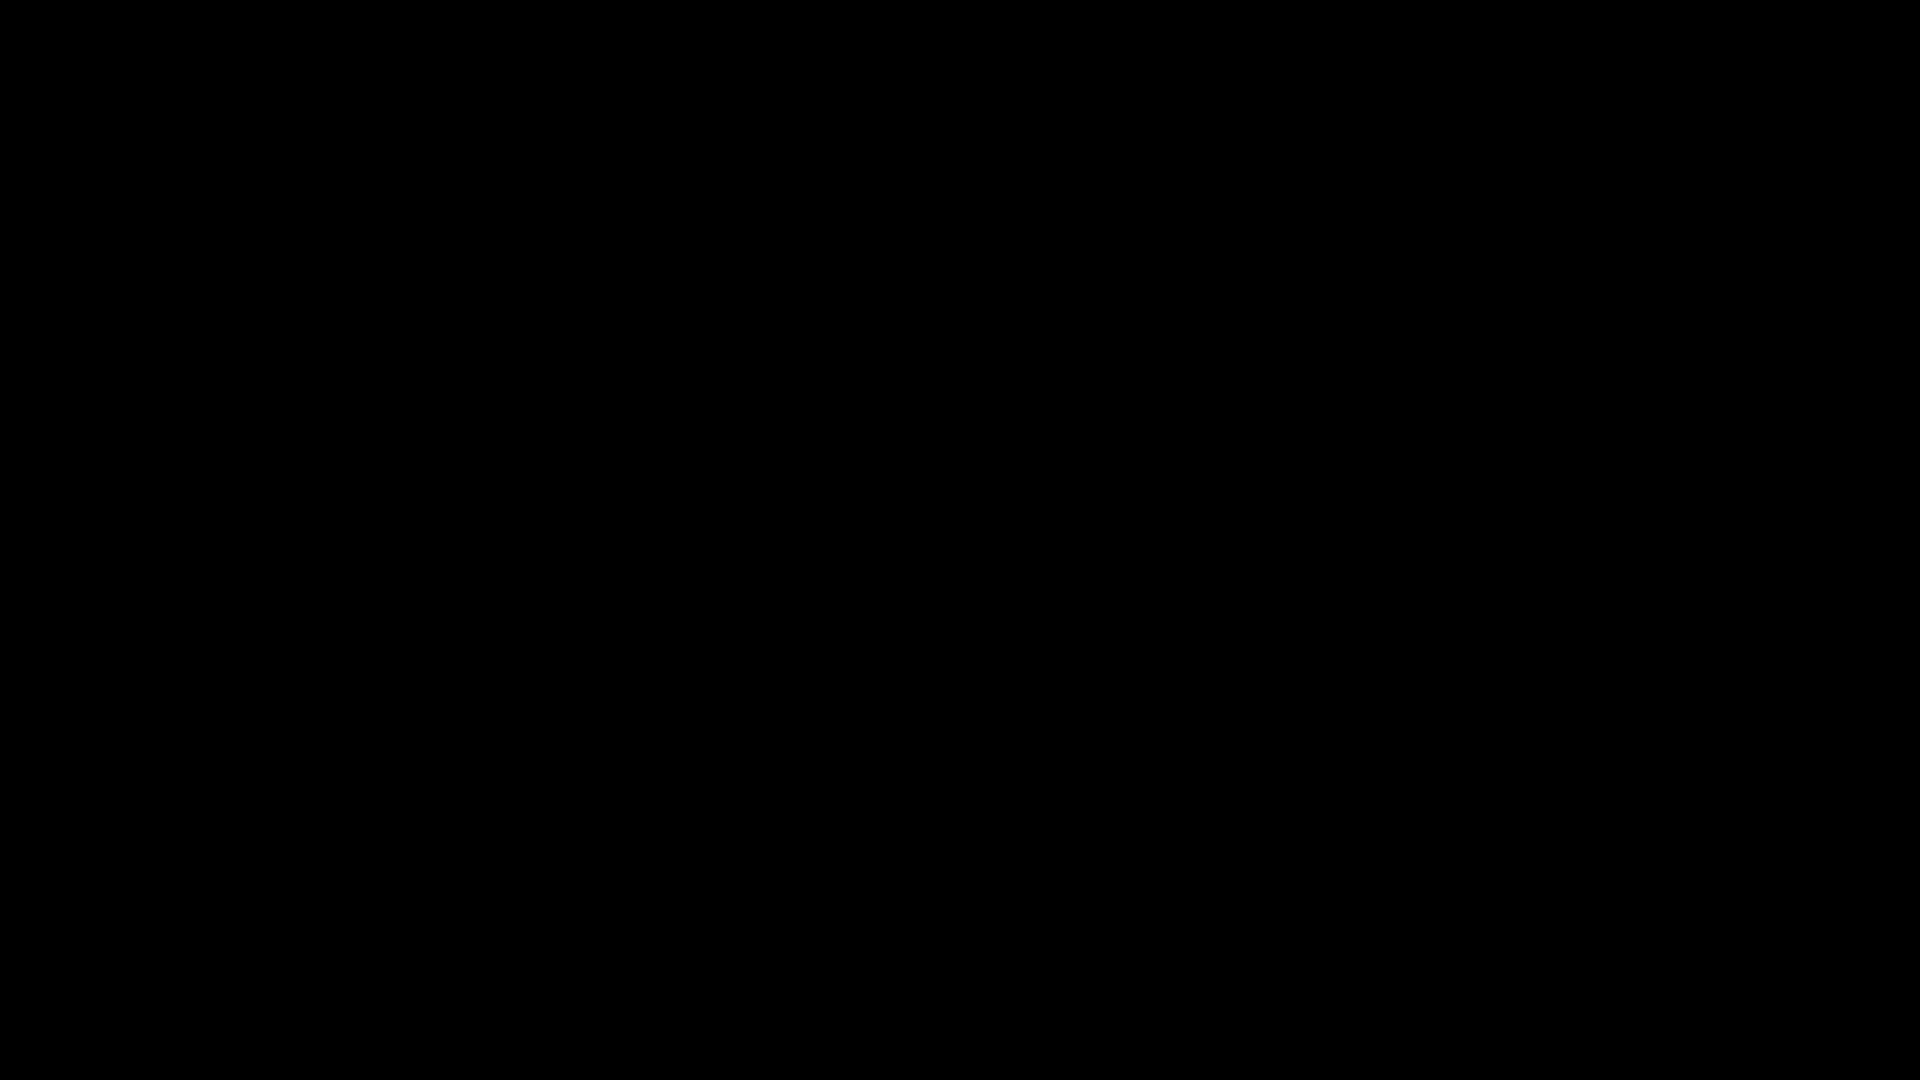 air trap schematic